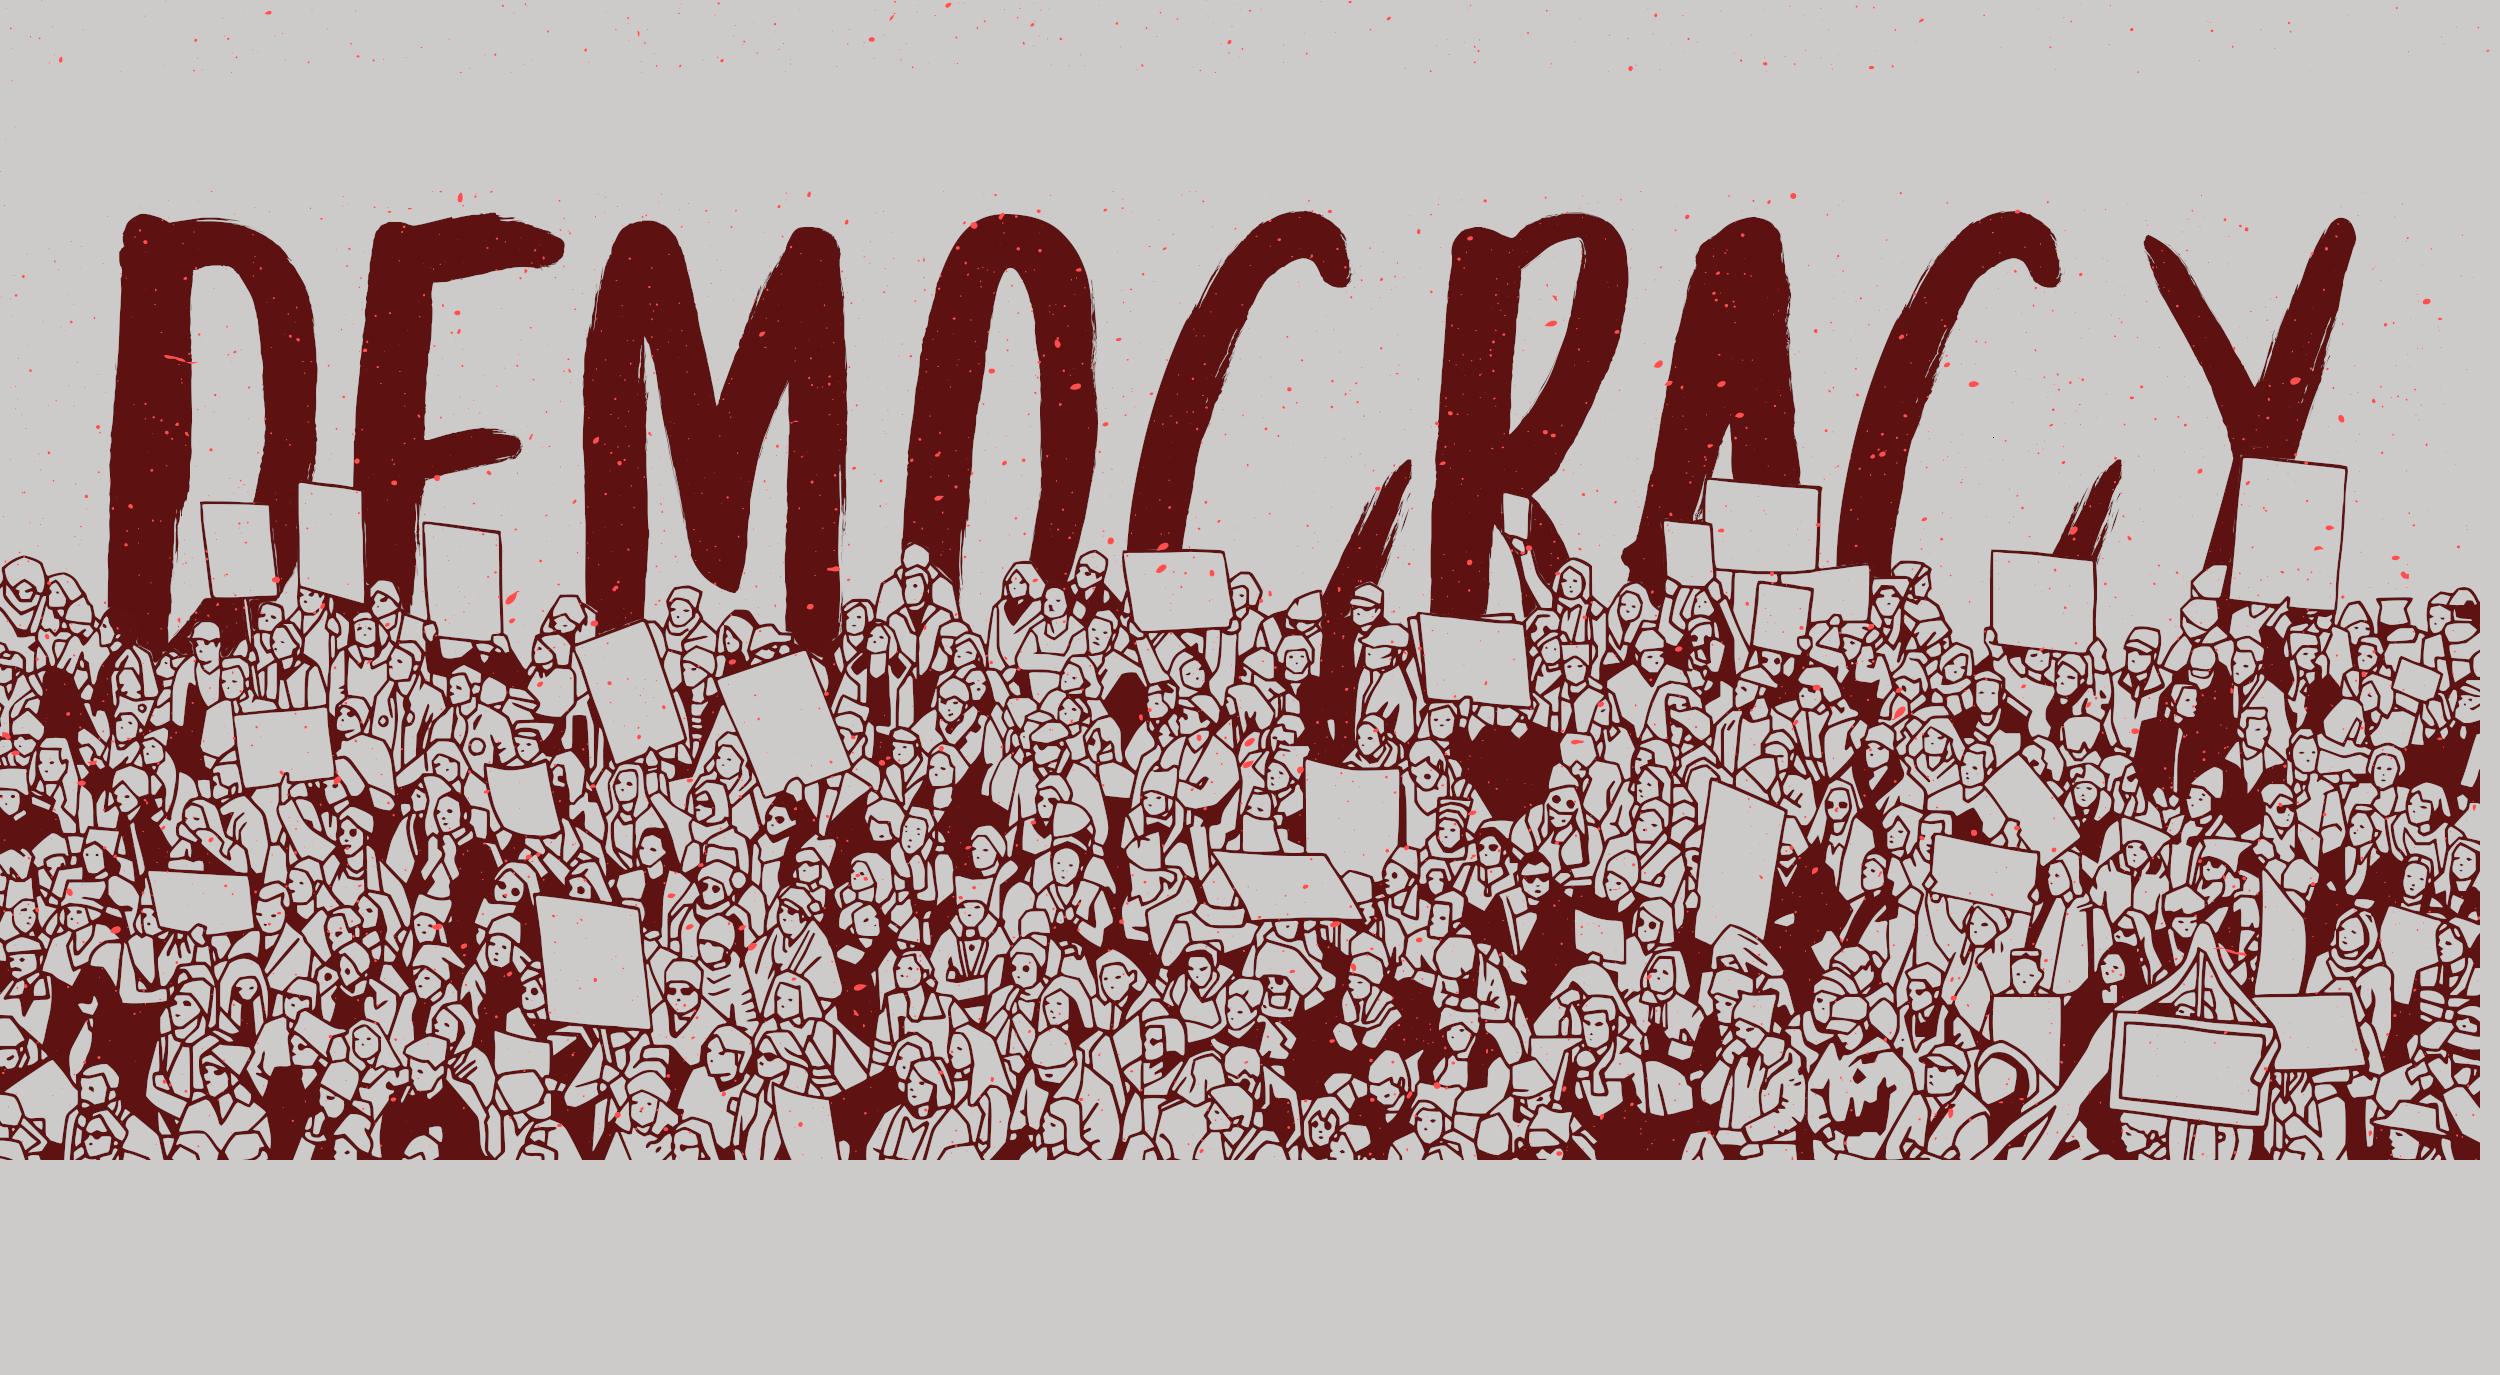 Democrazia E Democrazie Africane, Fra Narrazione Politica E Realtà Vissuta